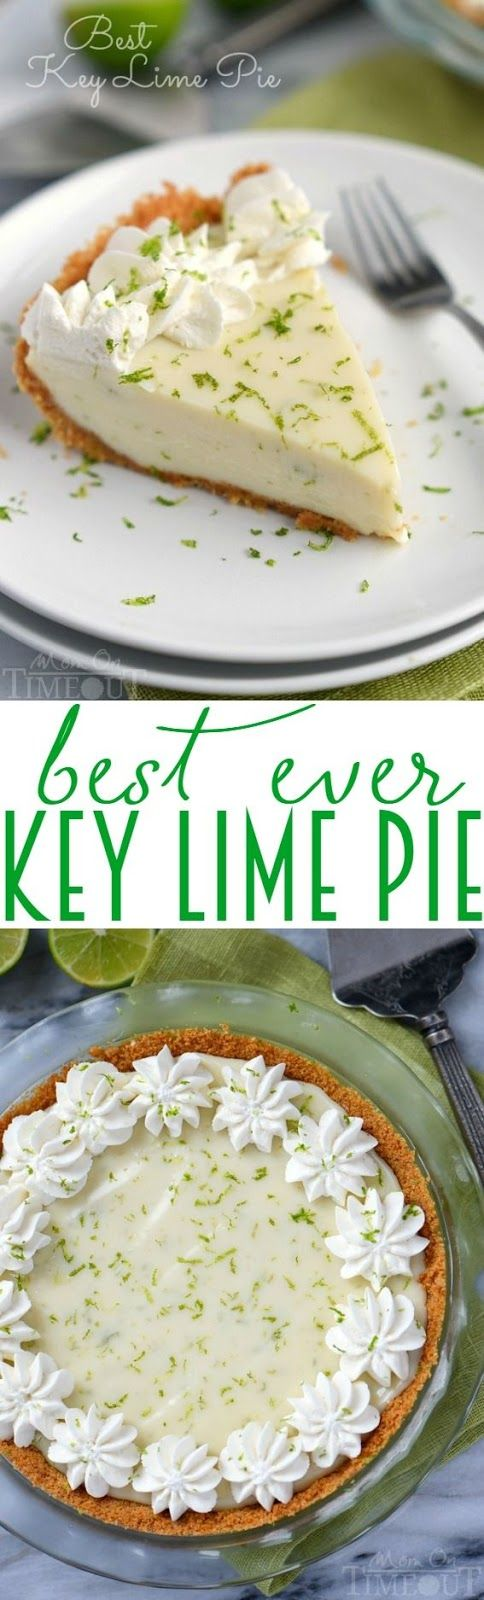 New Food & drink: Best Key Lime Pie